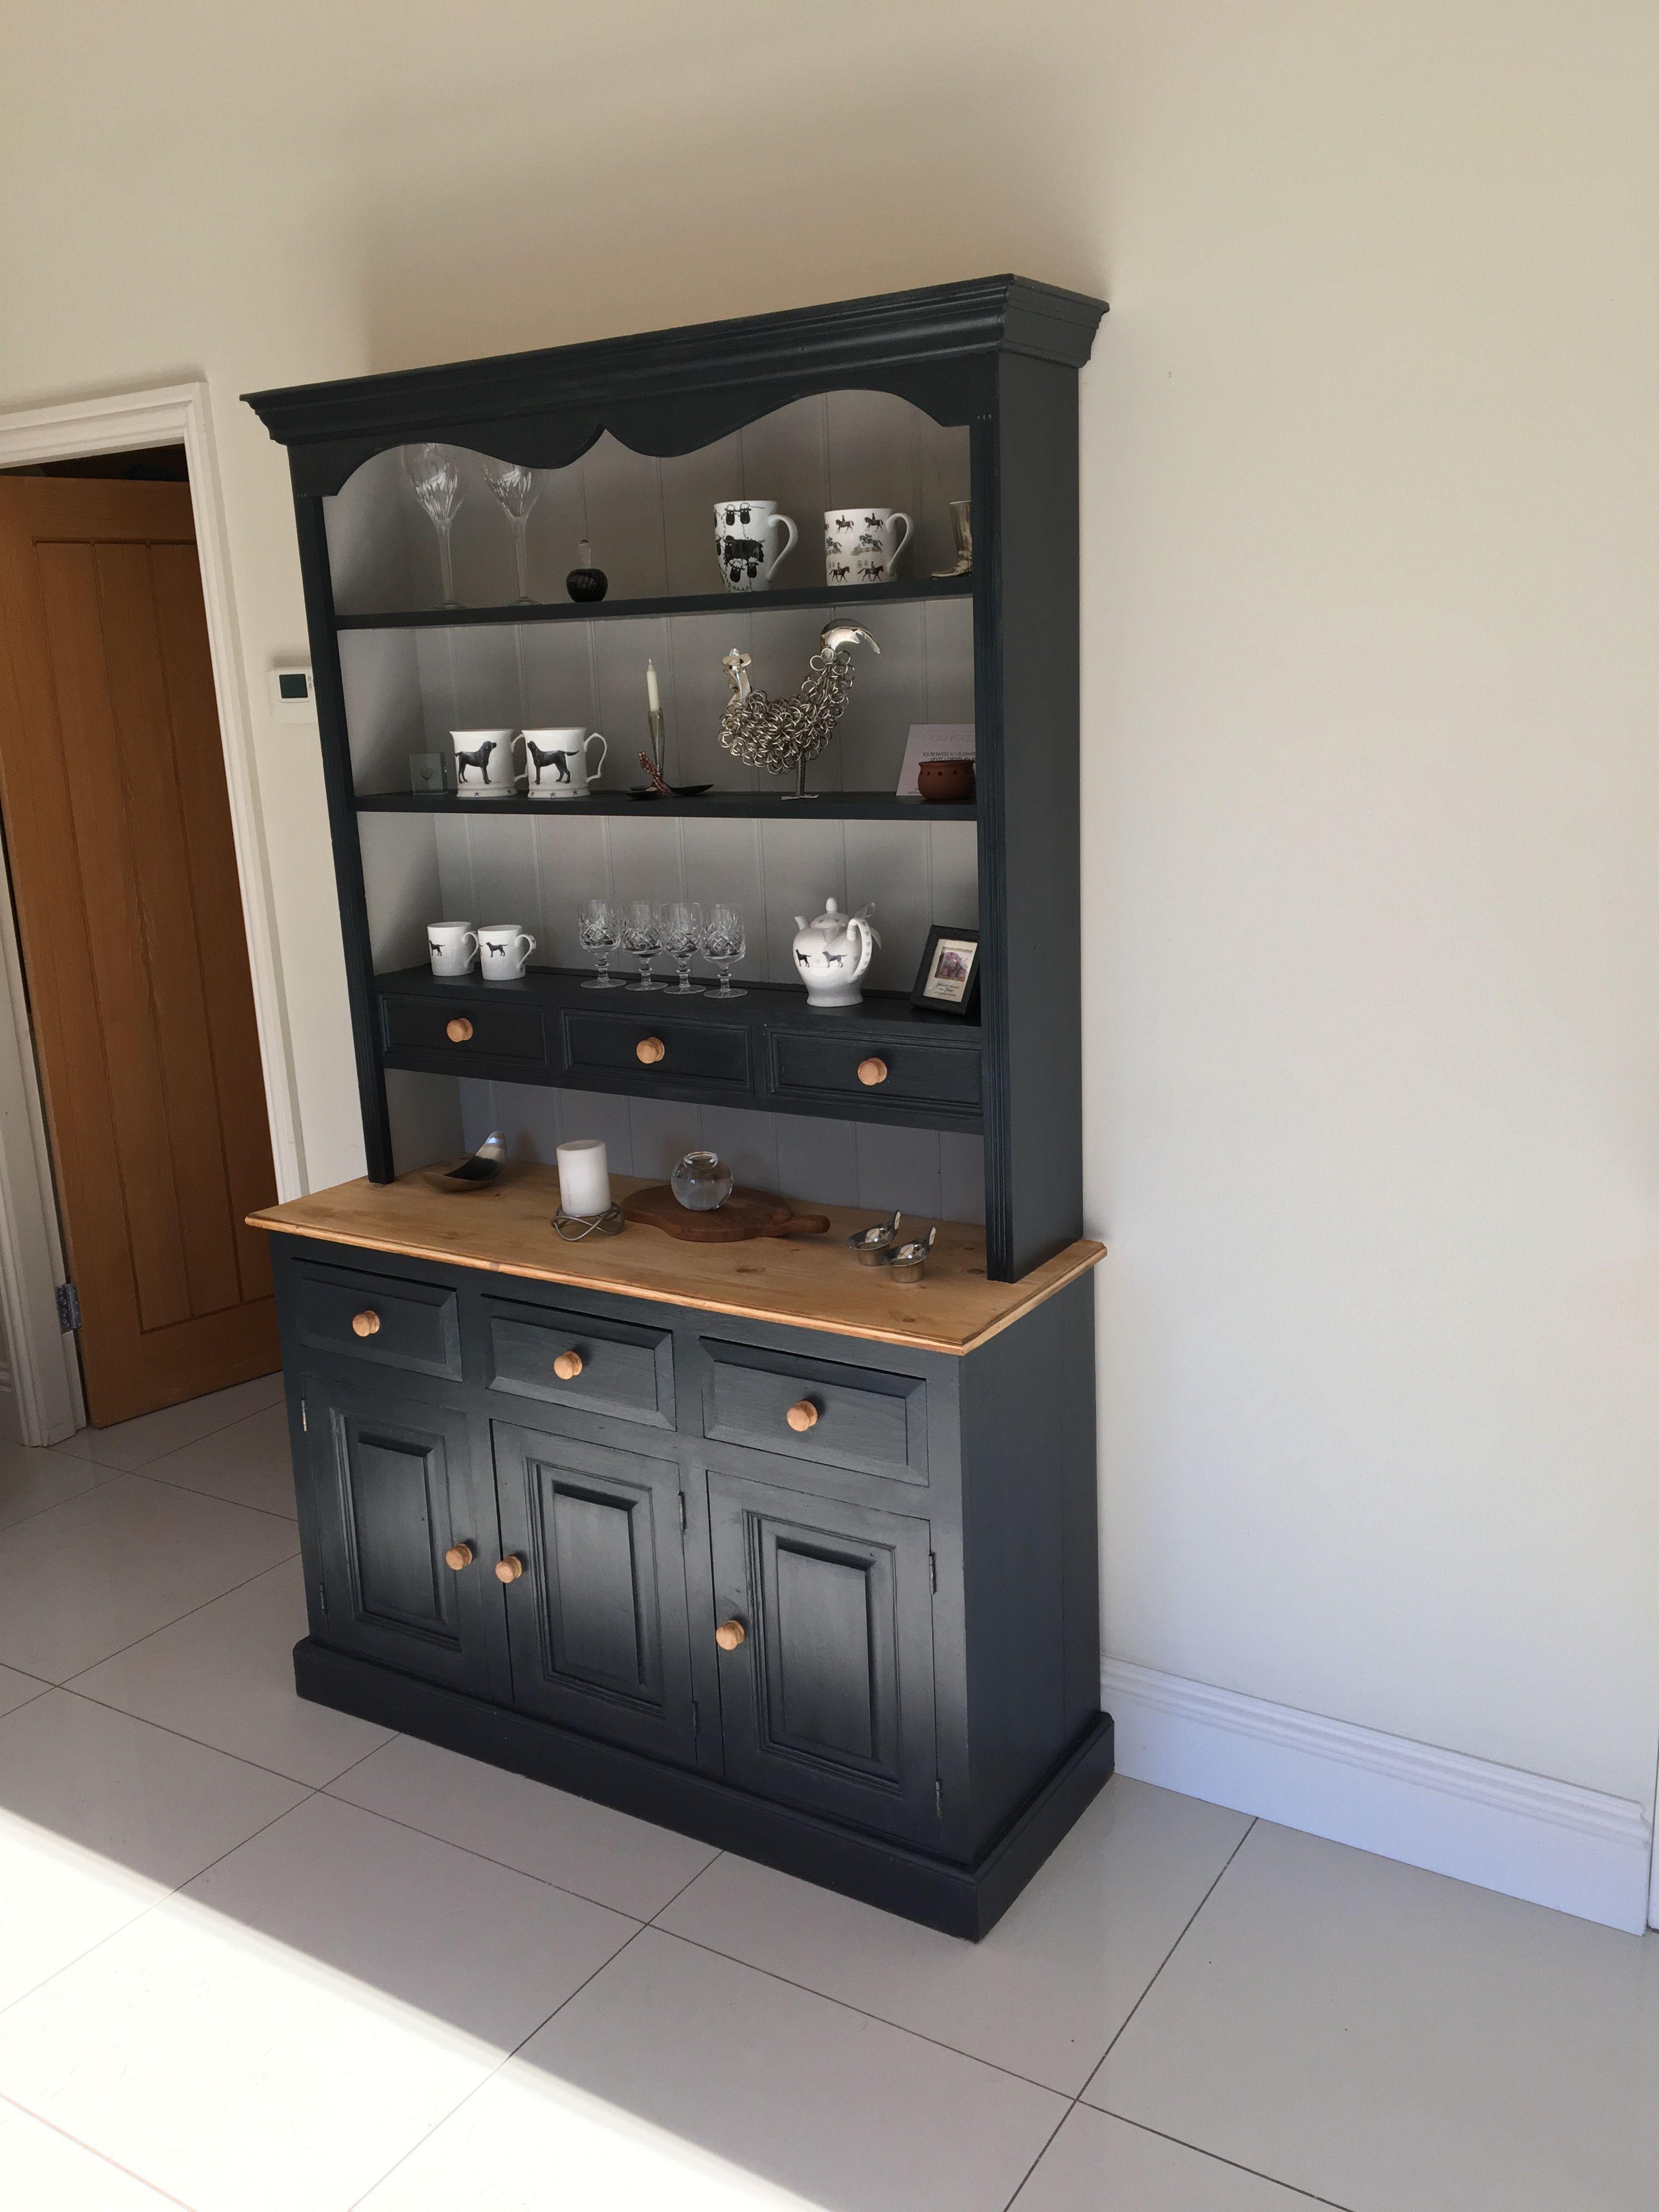 Farrow And Ball Railings Paint an old dresser painted in farrow & ball, railings & purbeck